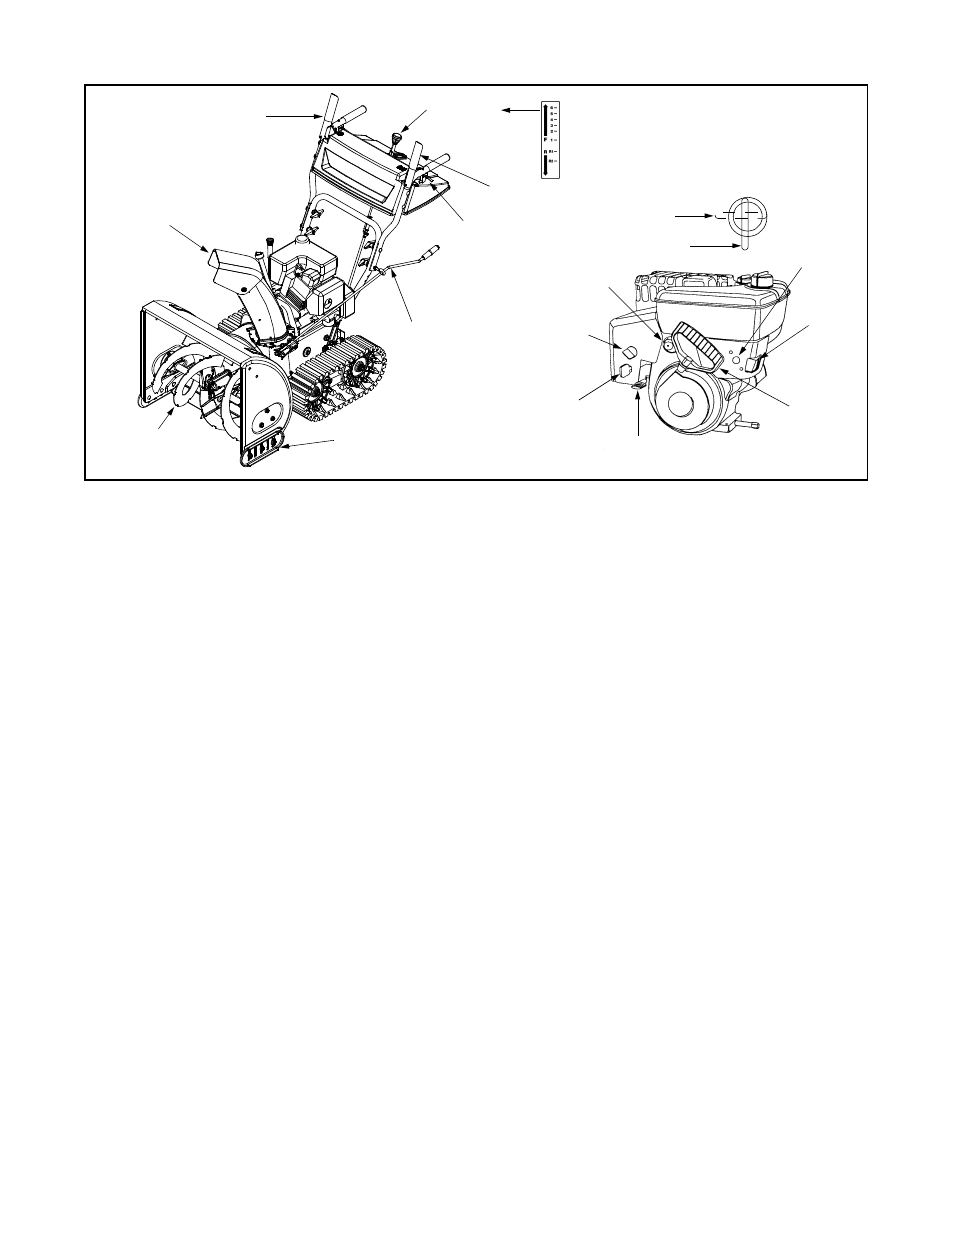 mtd 8 27 snowblower owners manual